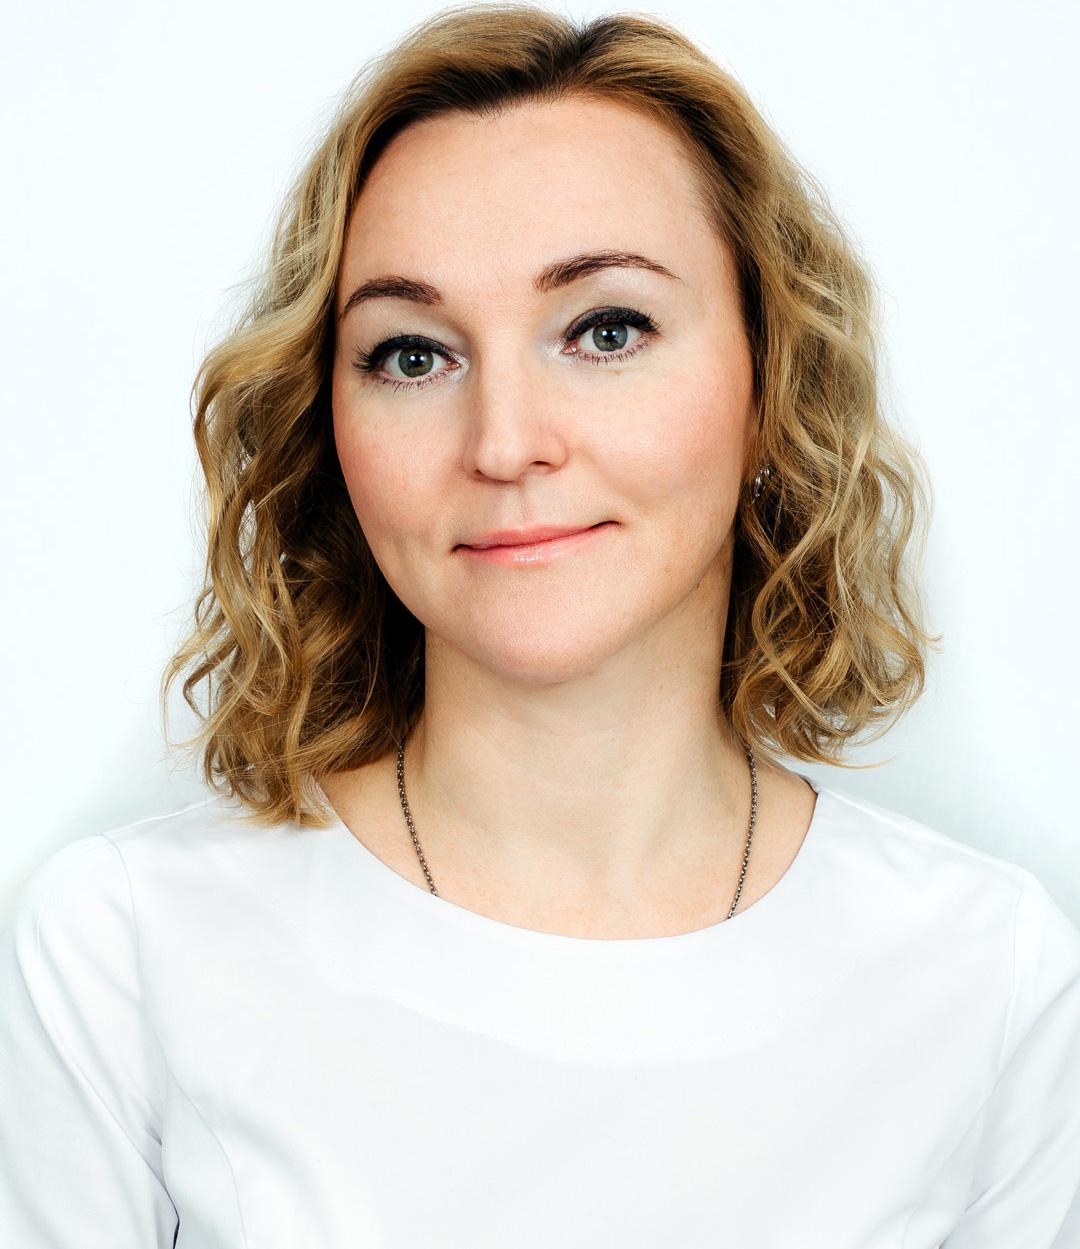 Яременко Наталья Валерьевна